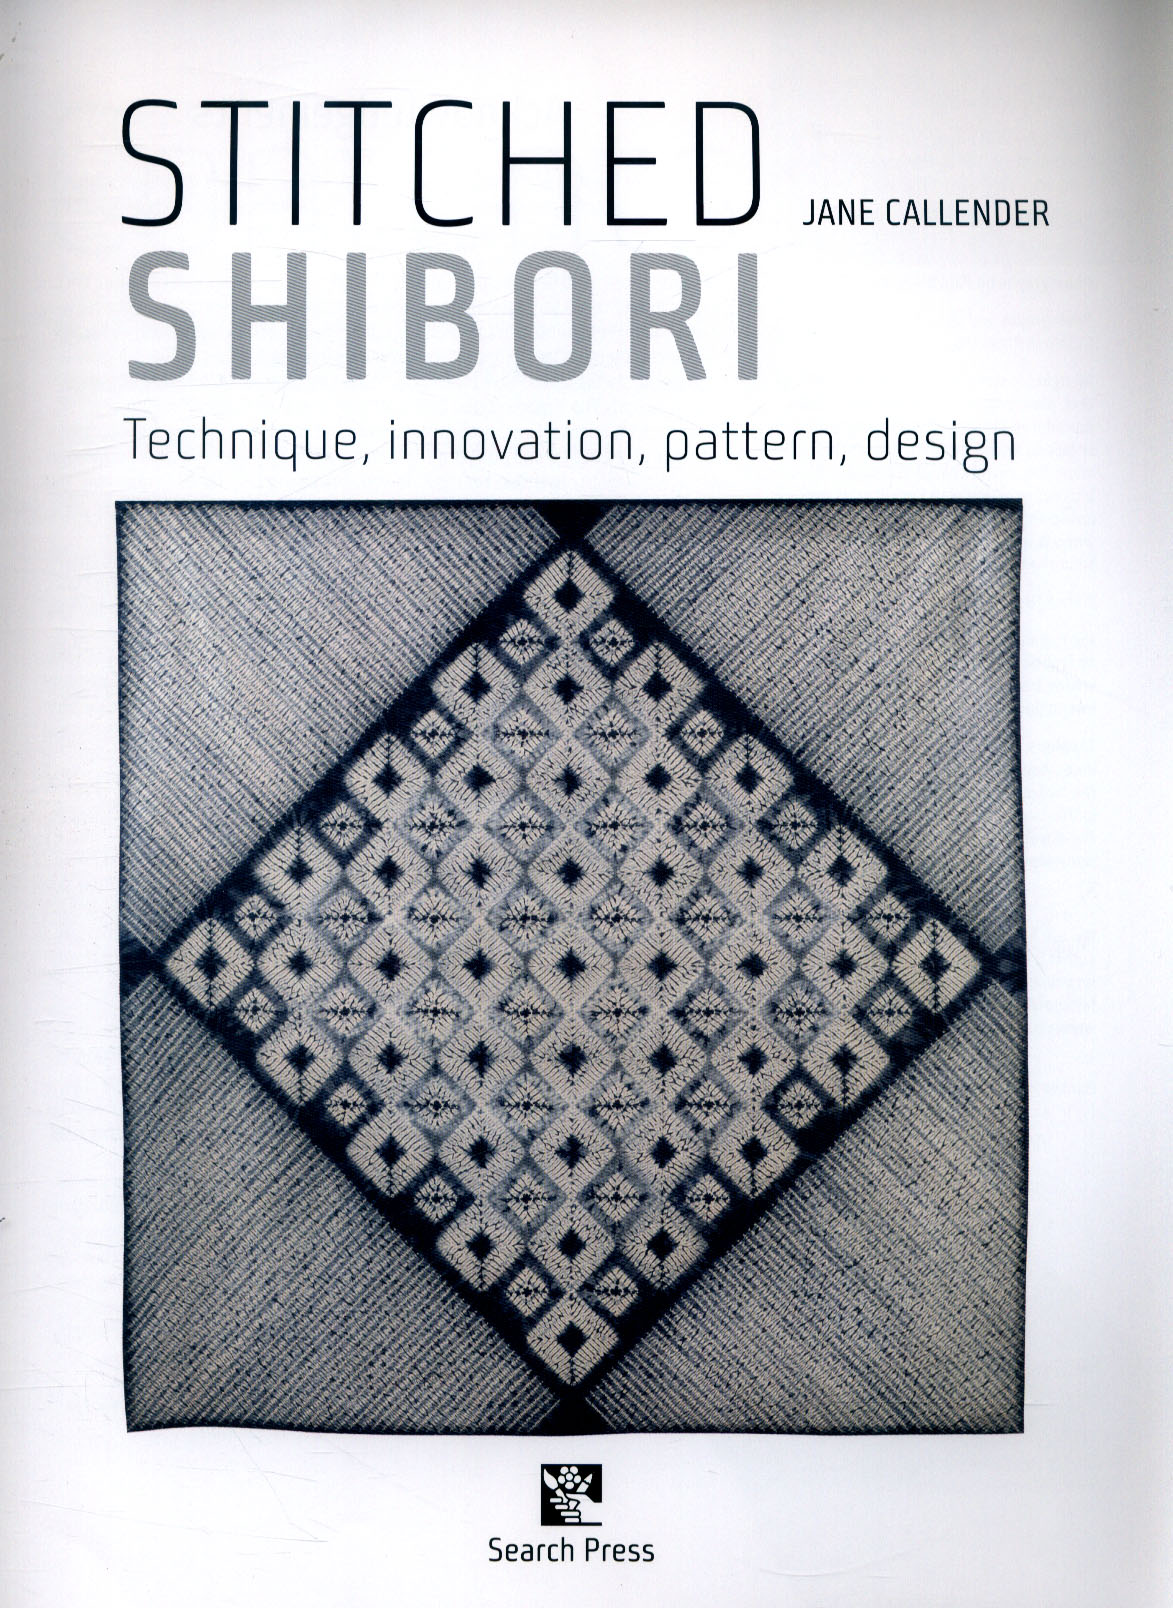 Stitched shibori : technique, innovation, pattern, design by